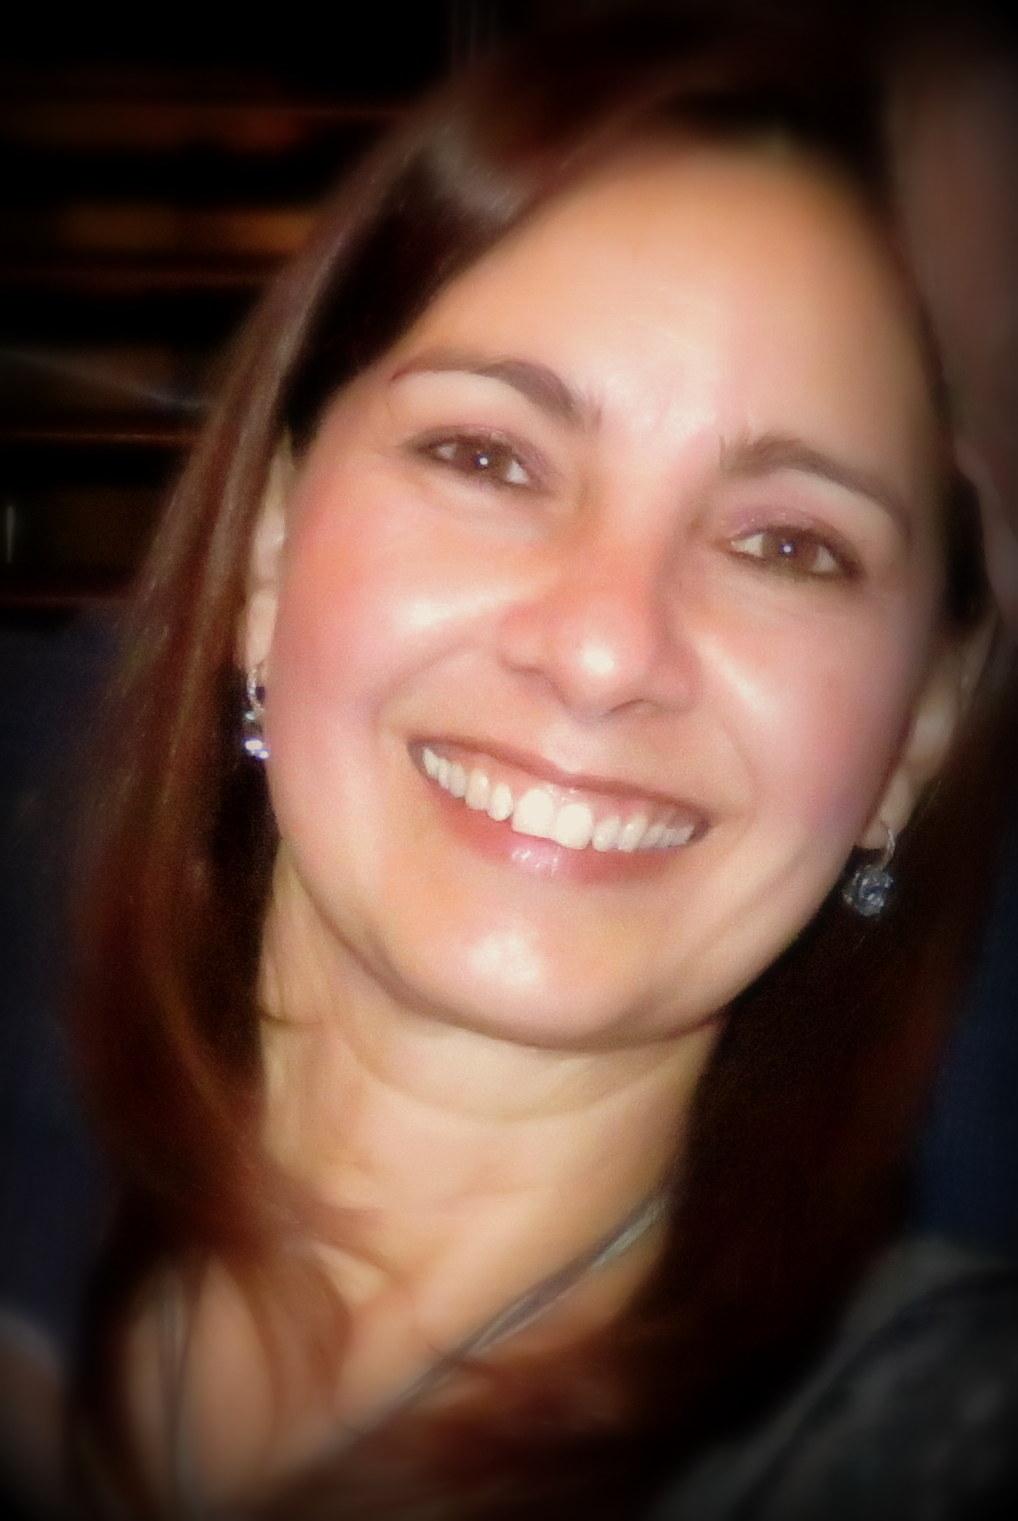 Dra.Natalia Silva Prada administradora del sitio